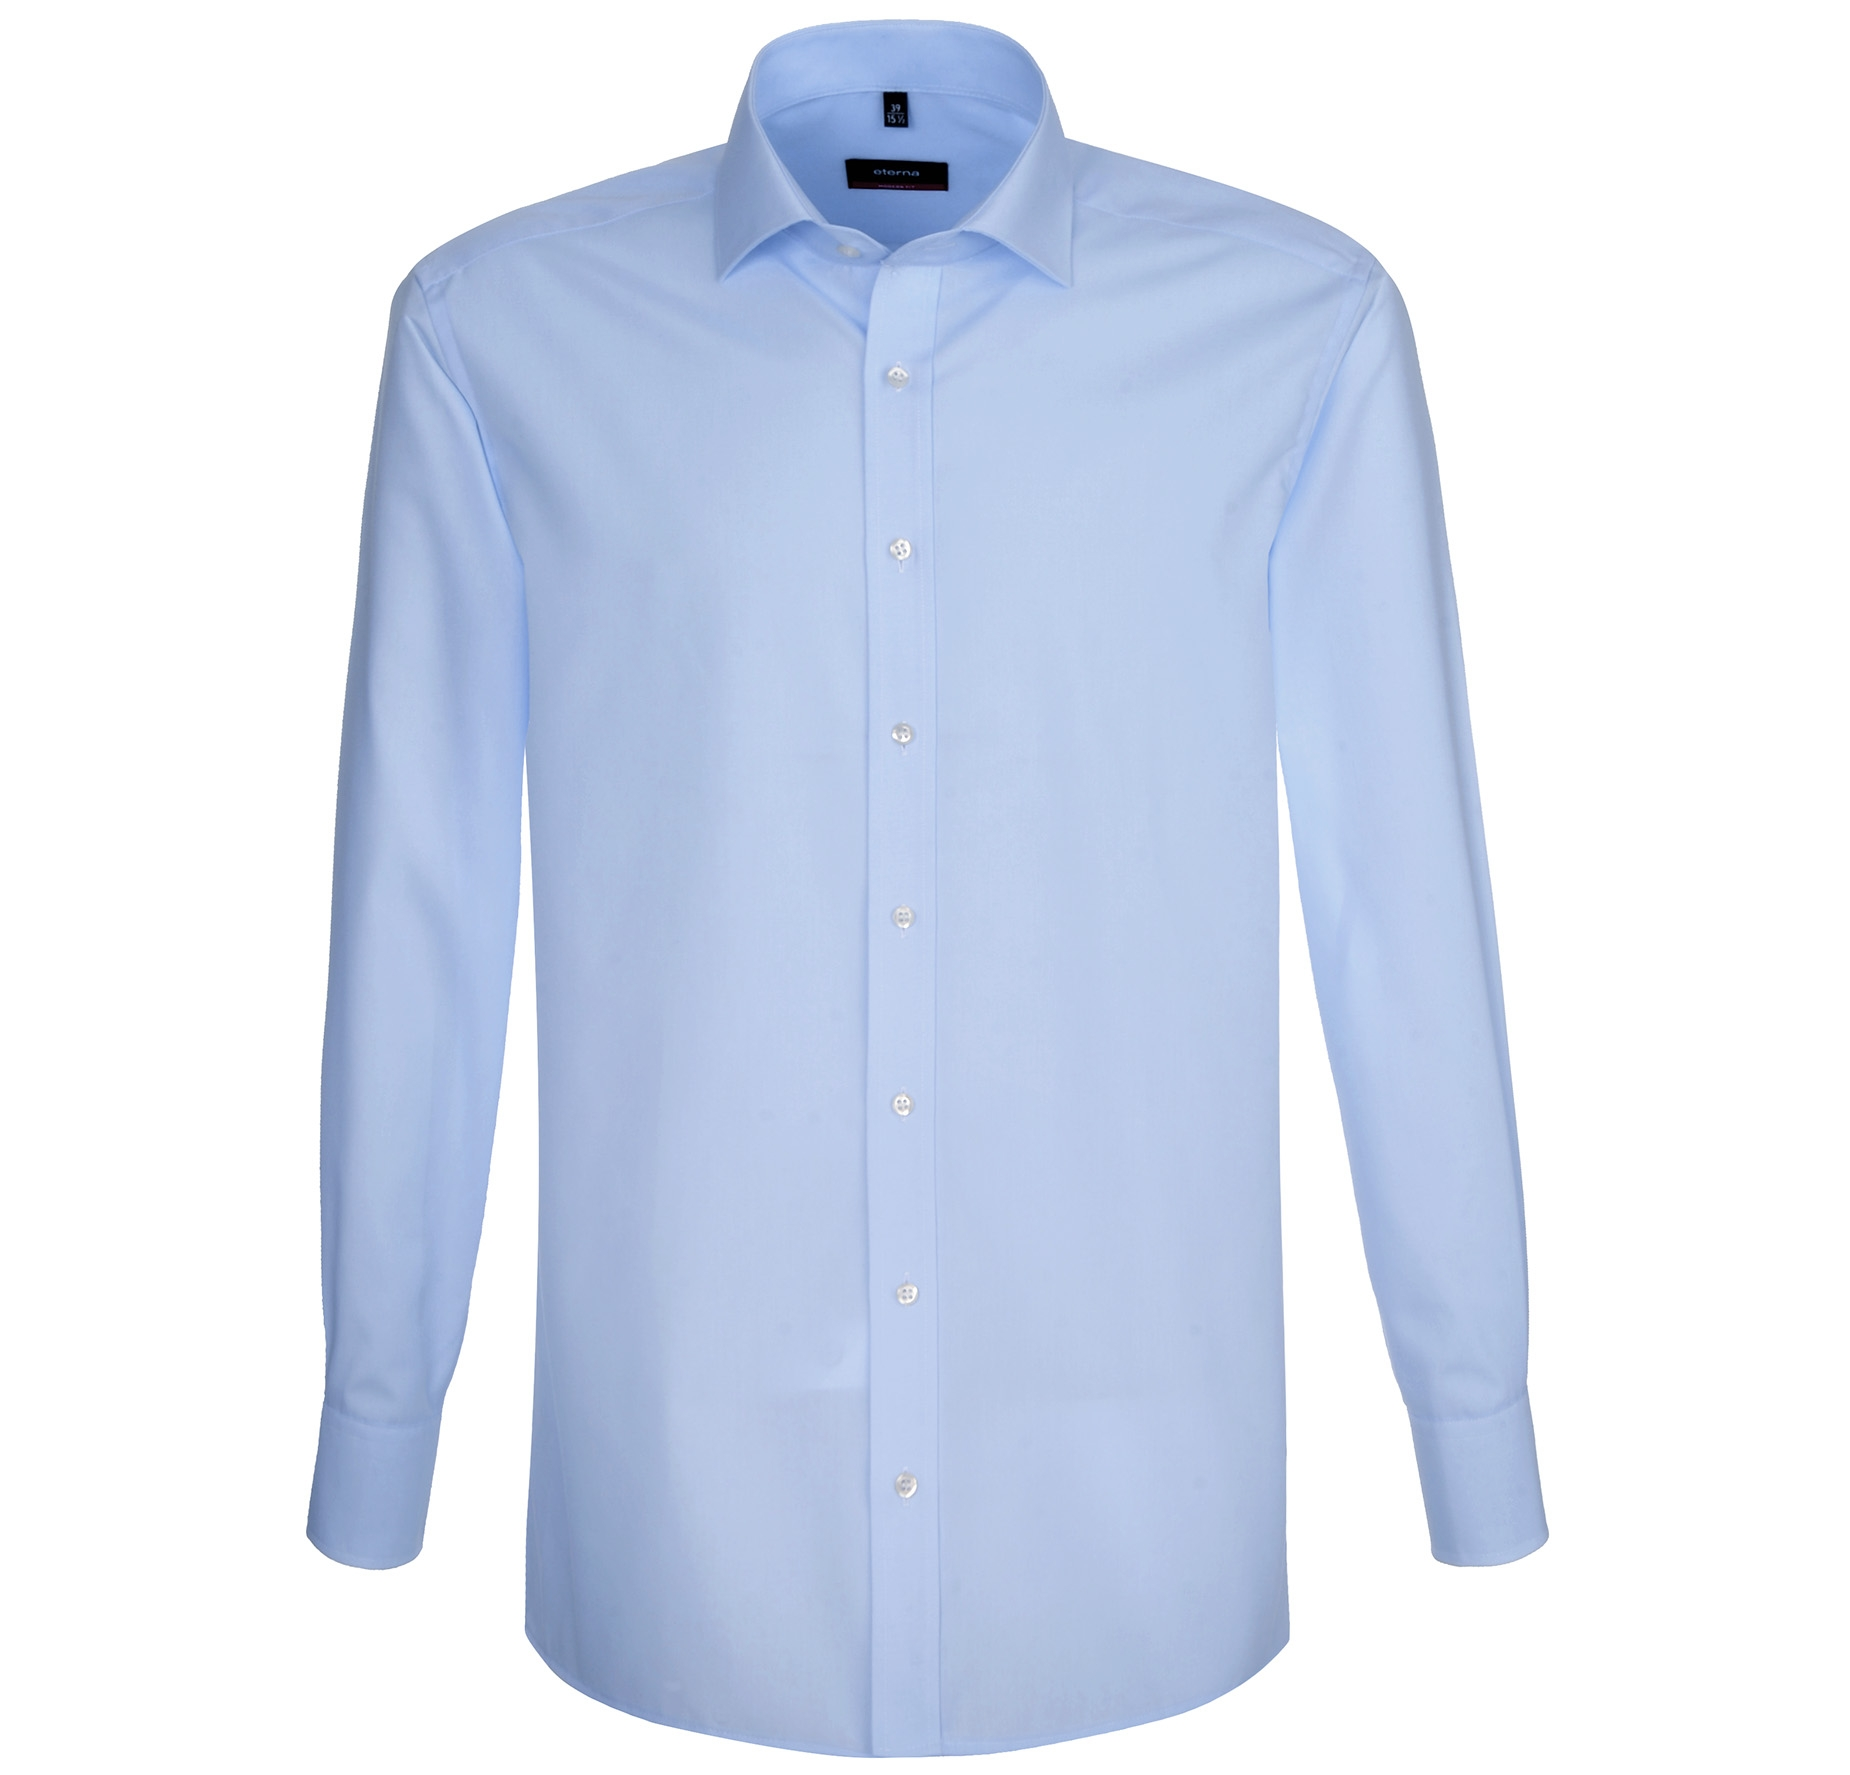 ETERNA-Herren-Langarm-Hemd-Slim-Modern-Comfort-Fit-weiss-blau-amp-schwarz